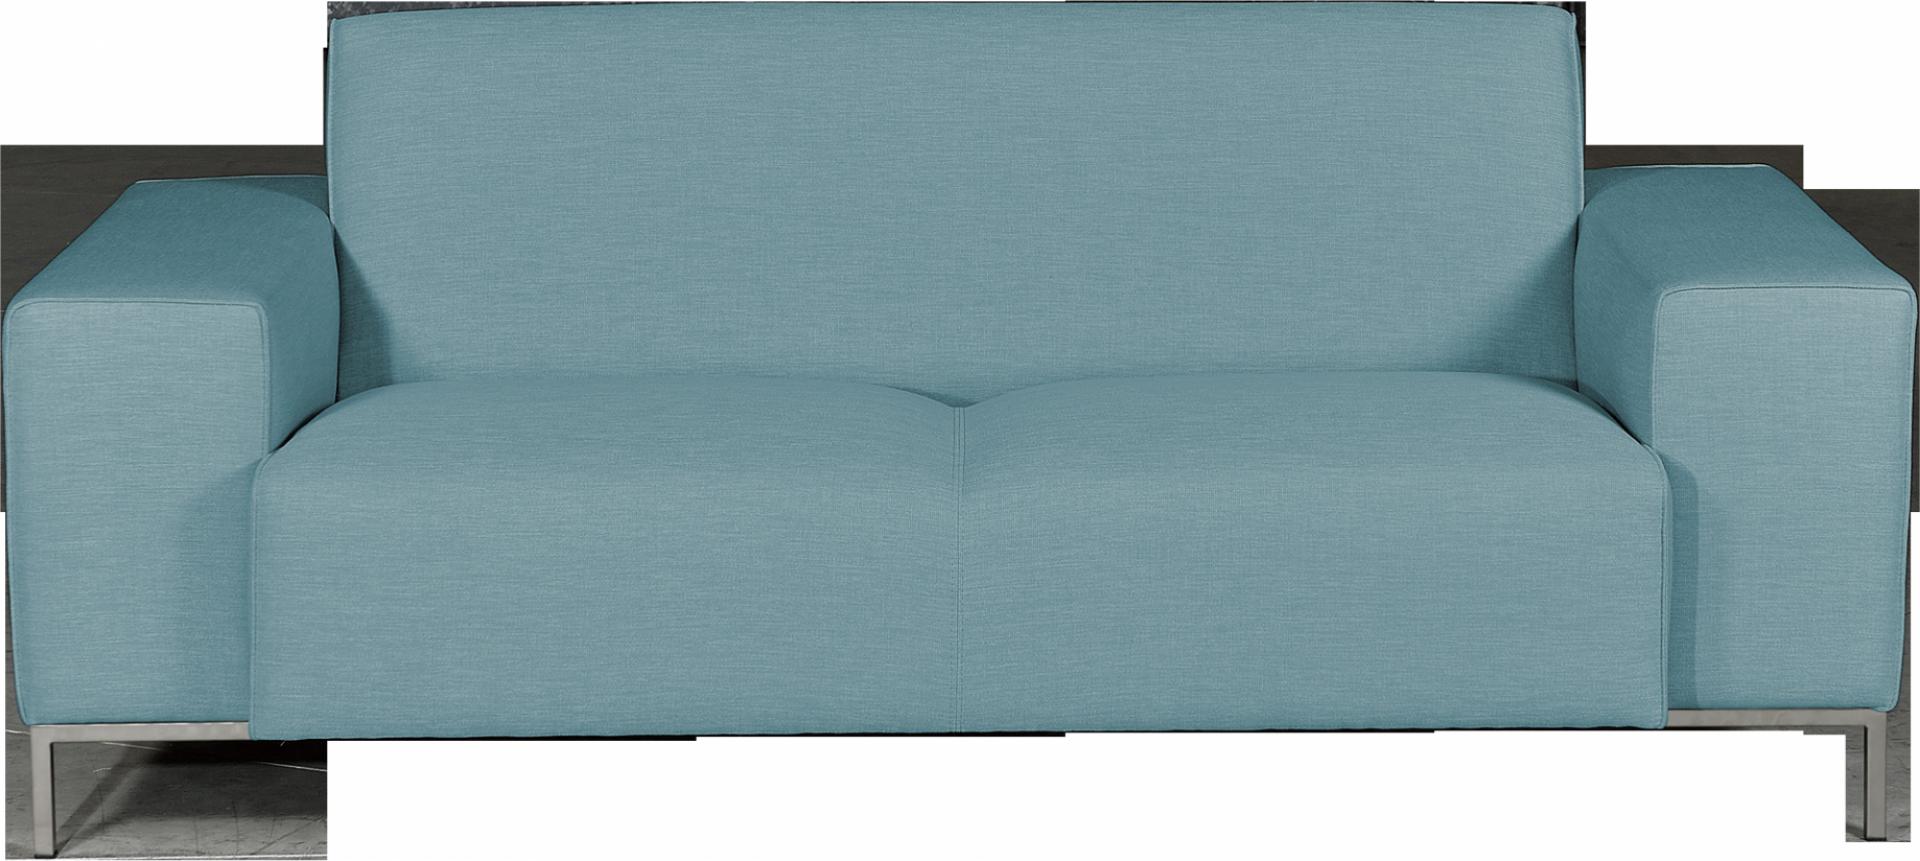 i Sofa Charlie 2 zits bank BlauwWoonkamer